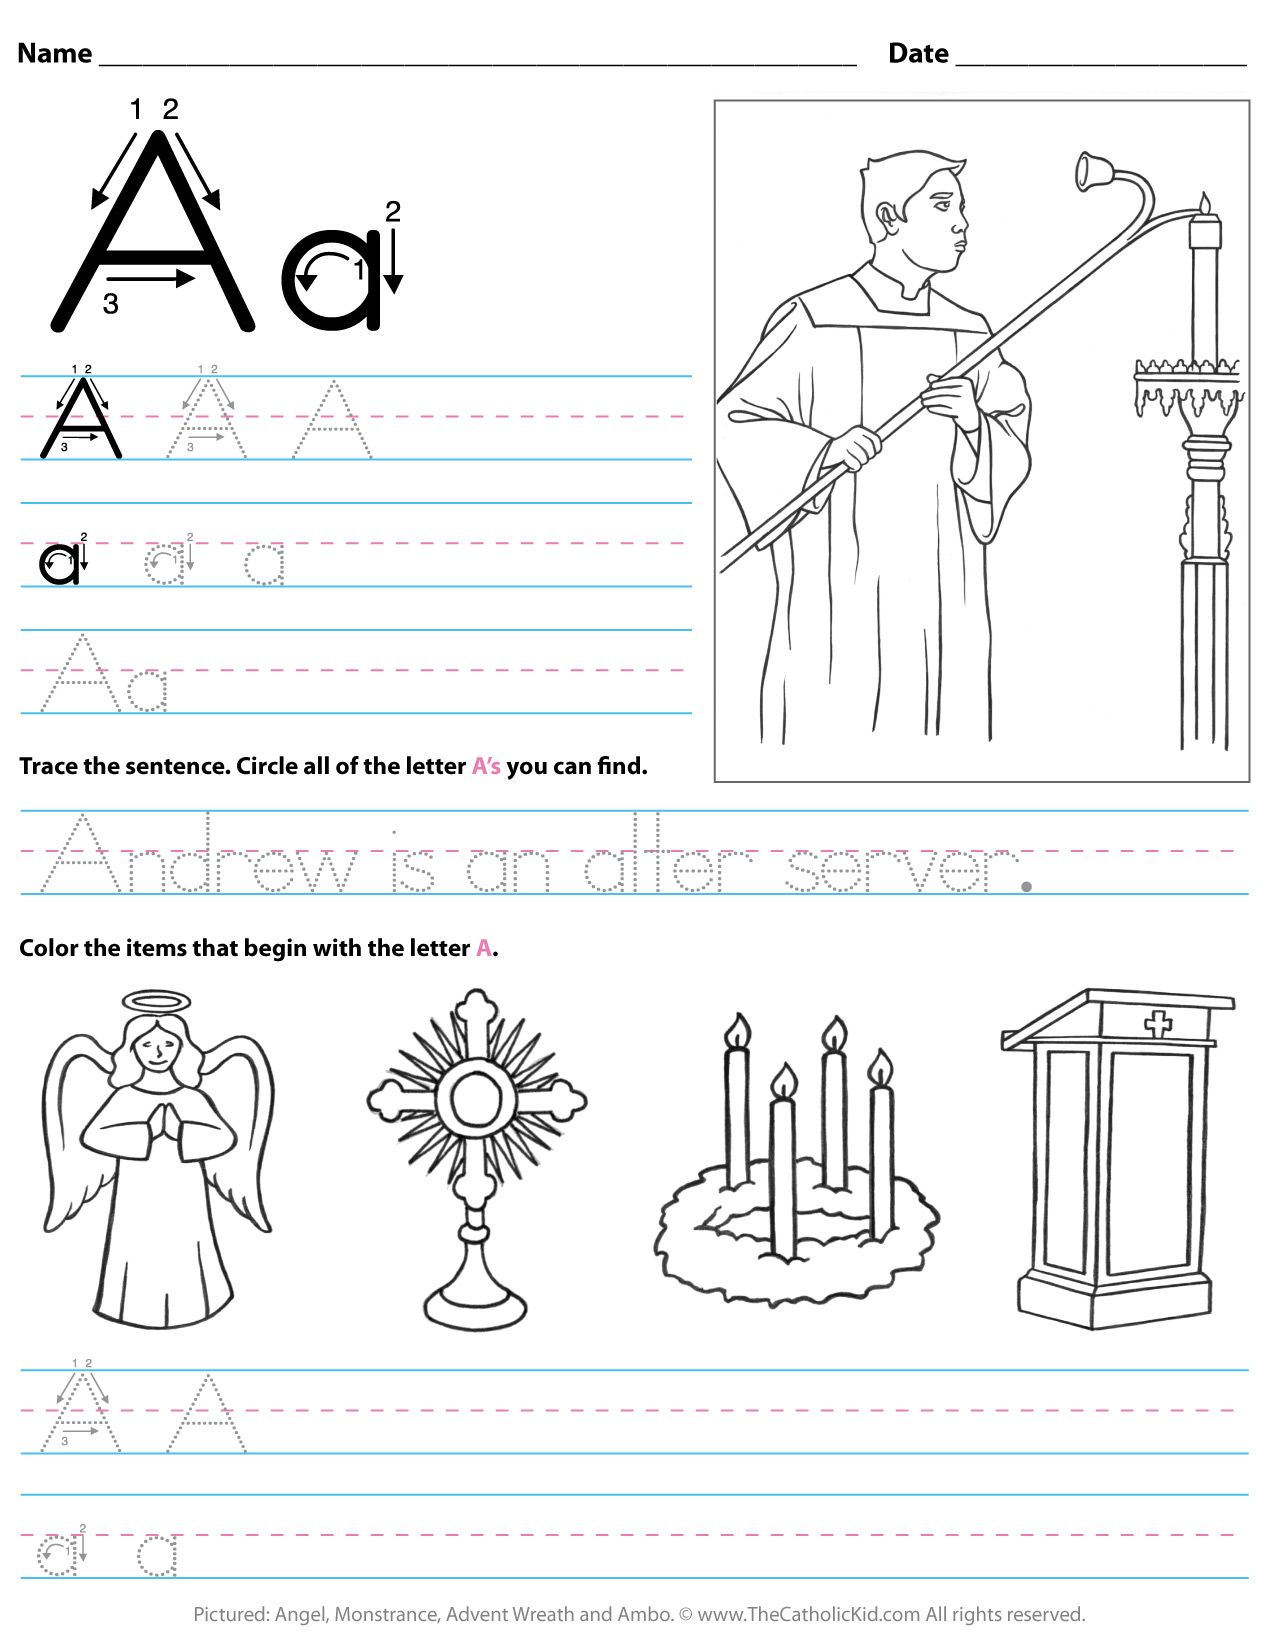 Catholic Alphabet Letter A Worksheet Preschool Kindergarten -  TheCatholicKid.com   Preschool worksheets [ 1650 x 1275 Pixel ]